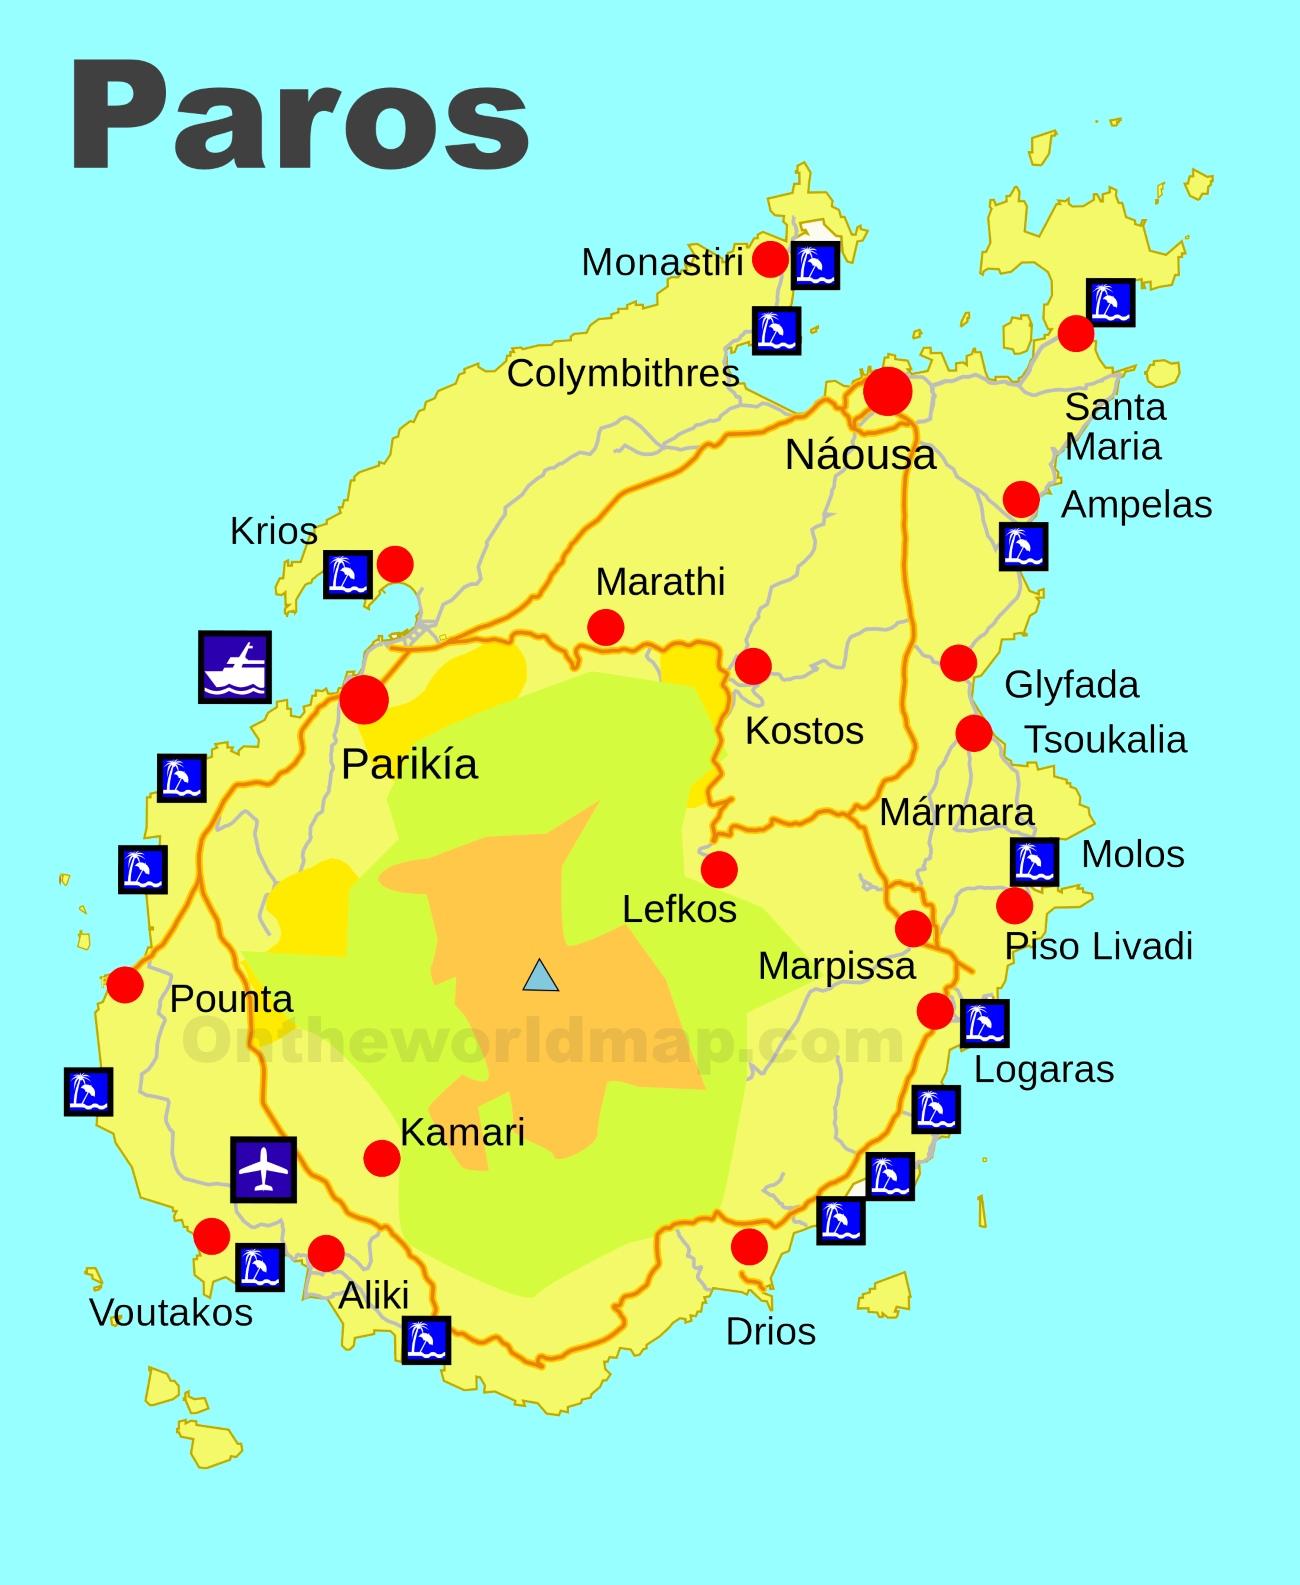 Paros Beaches Map - World map image in marathi